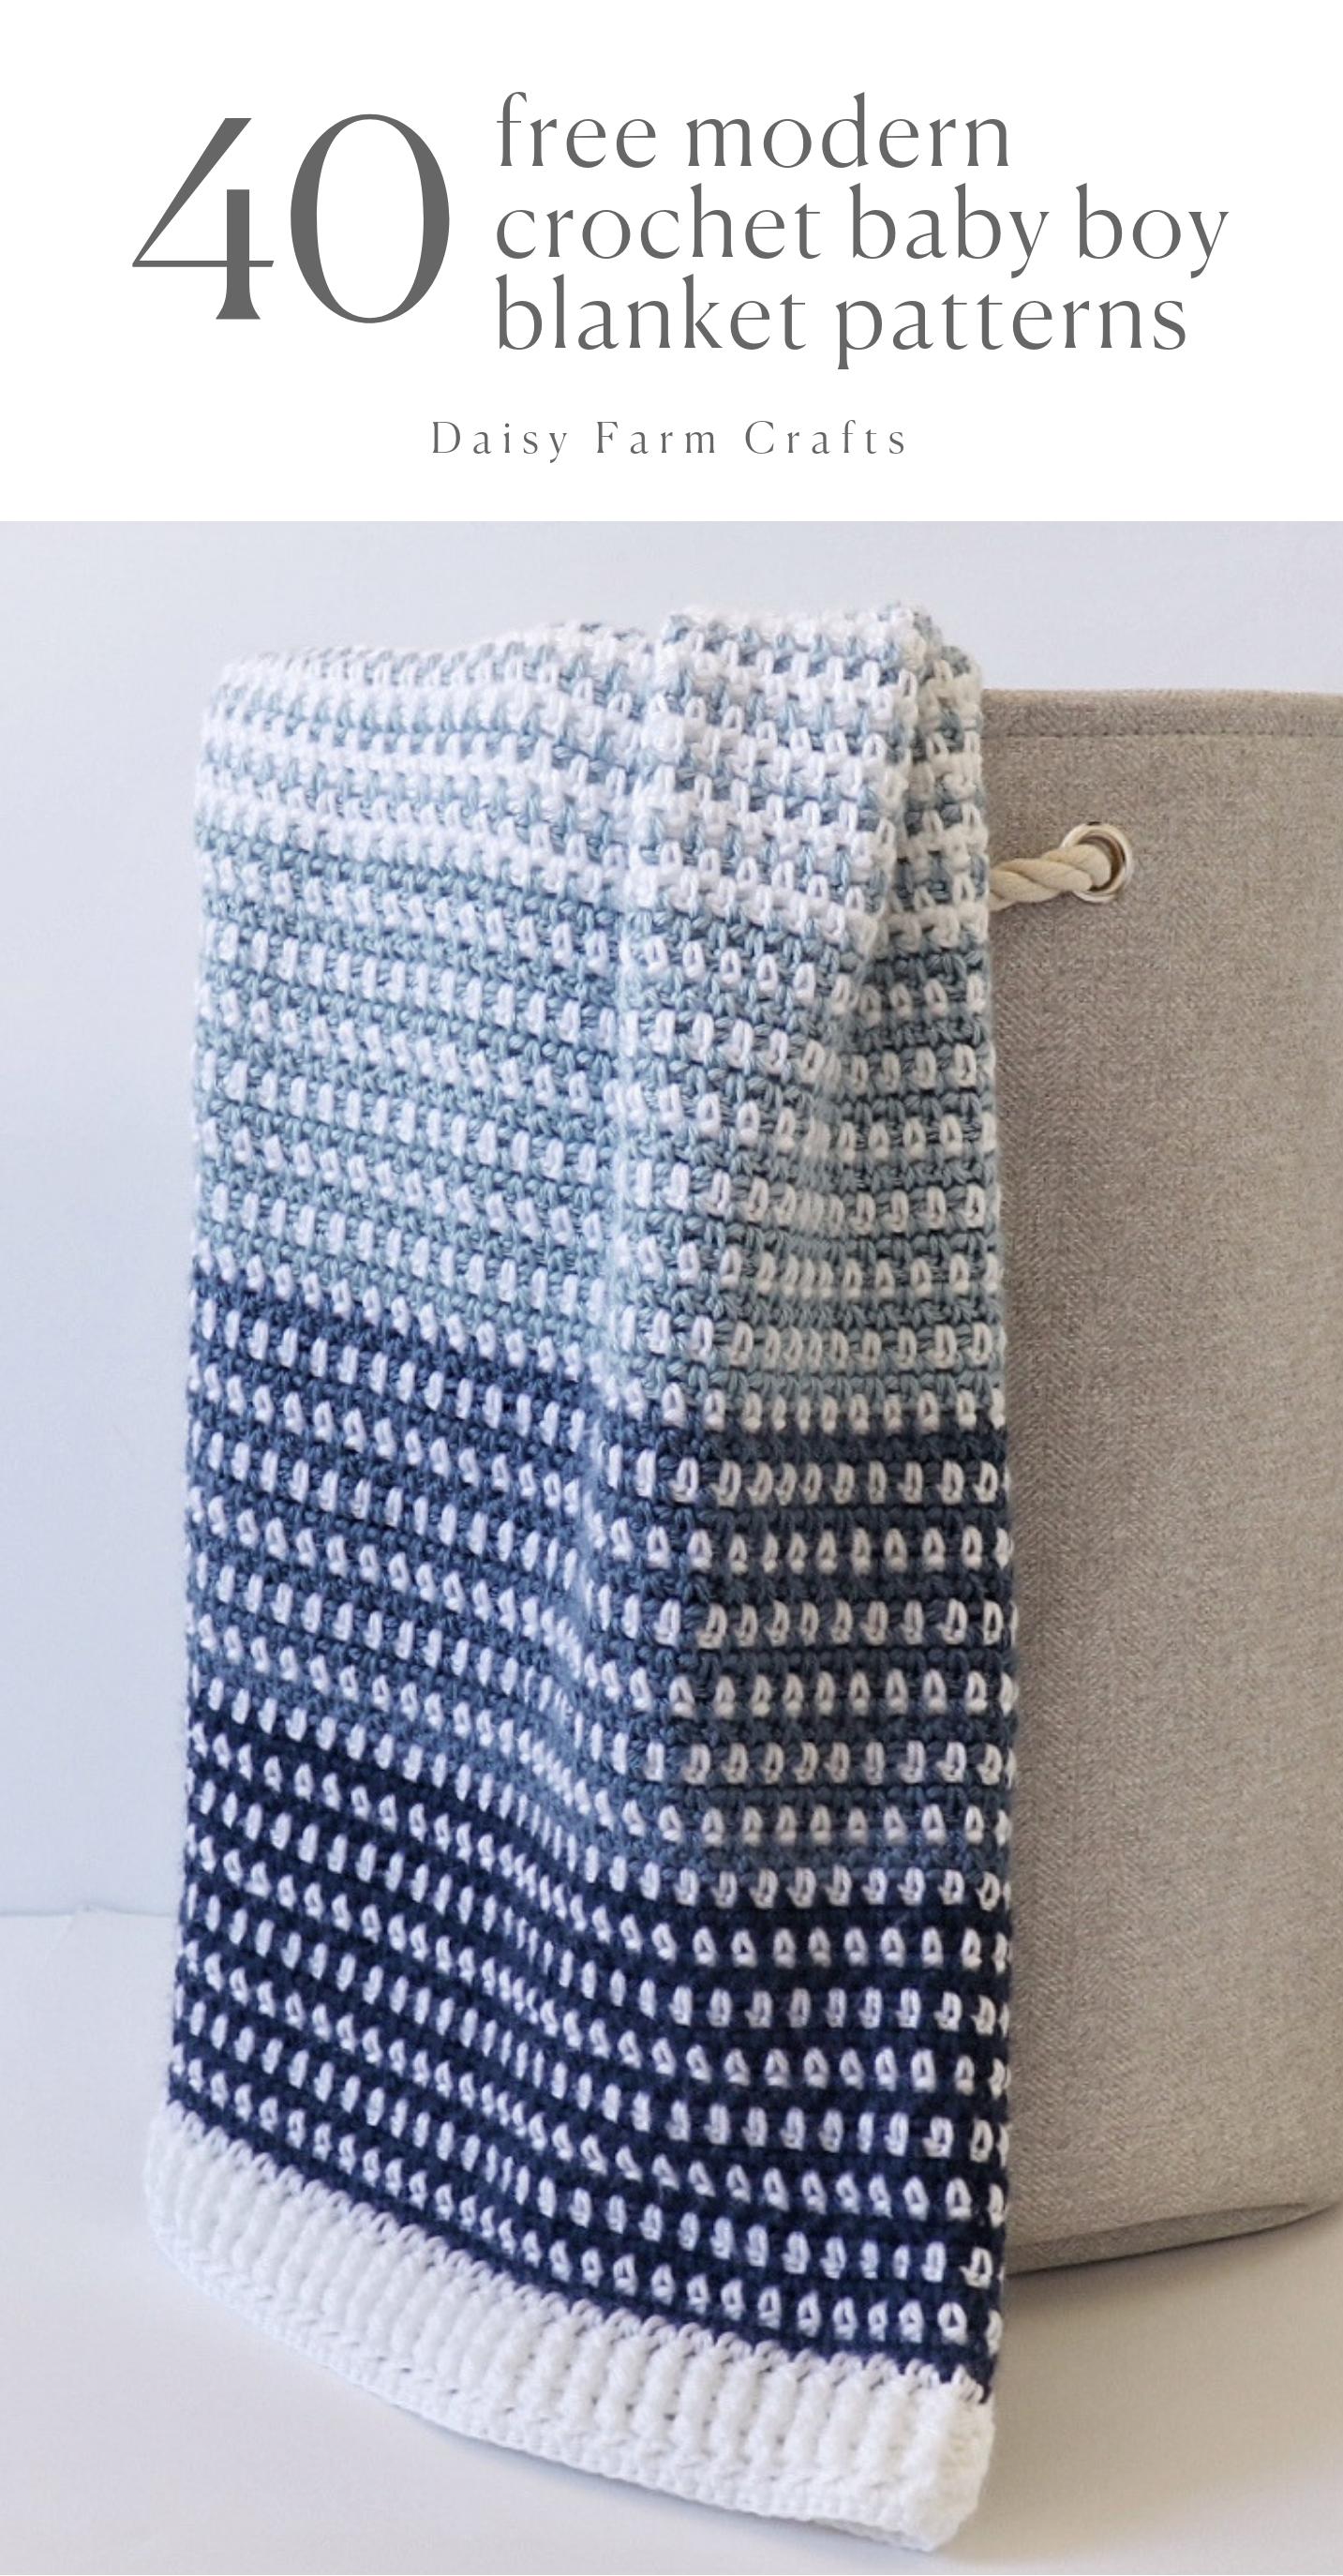 Photo of 40 Free Modern Crochet Baby Boy Blanket Patterns from Daisy Farm Crafts